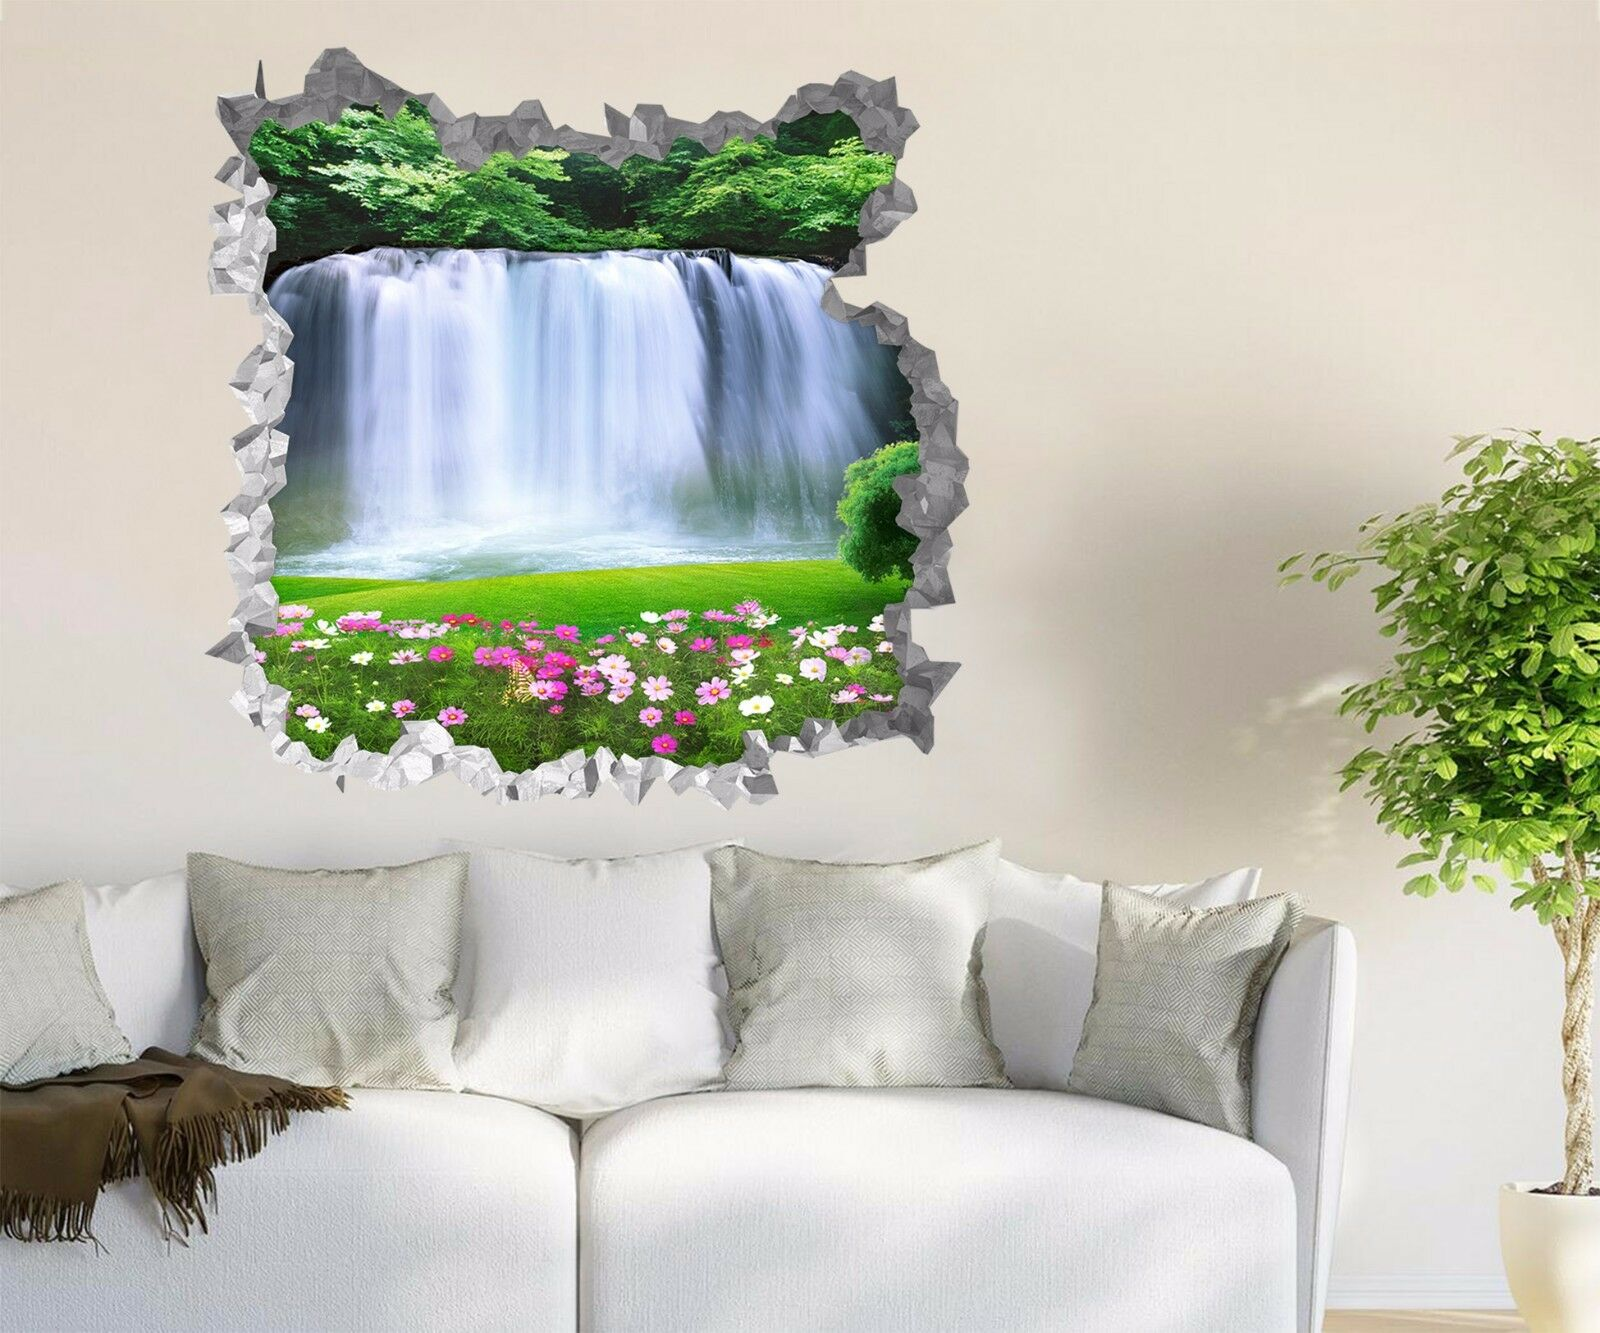 3D Flowers Wasserfall 98 Wall Murals Wall Stickers Decal Durchbruch AJ WALL CA